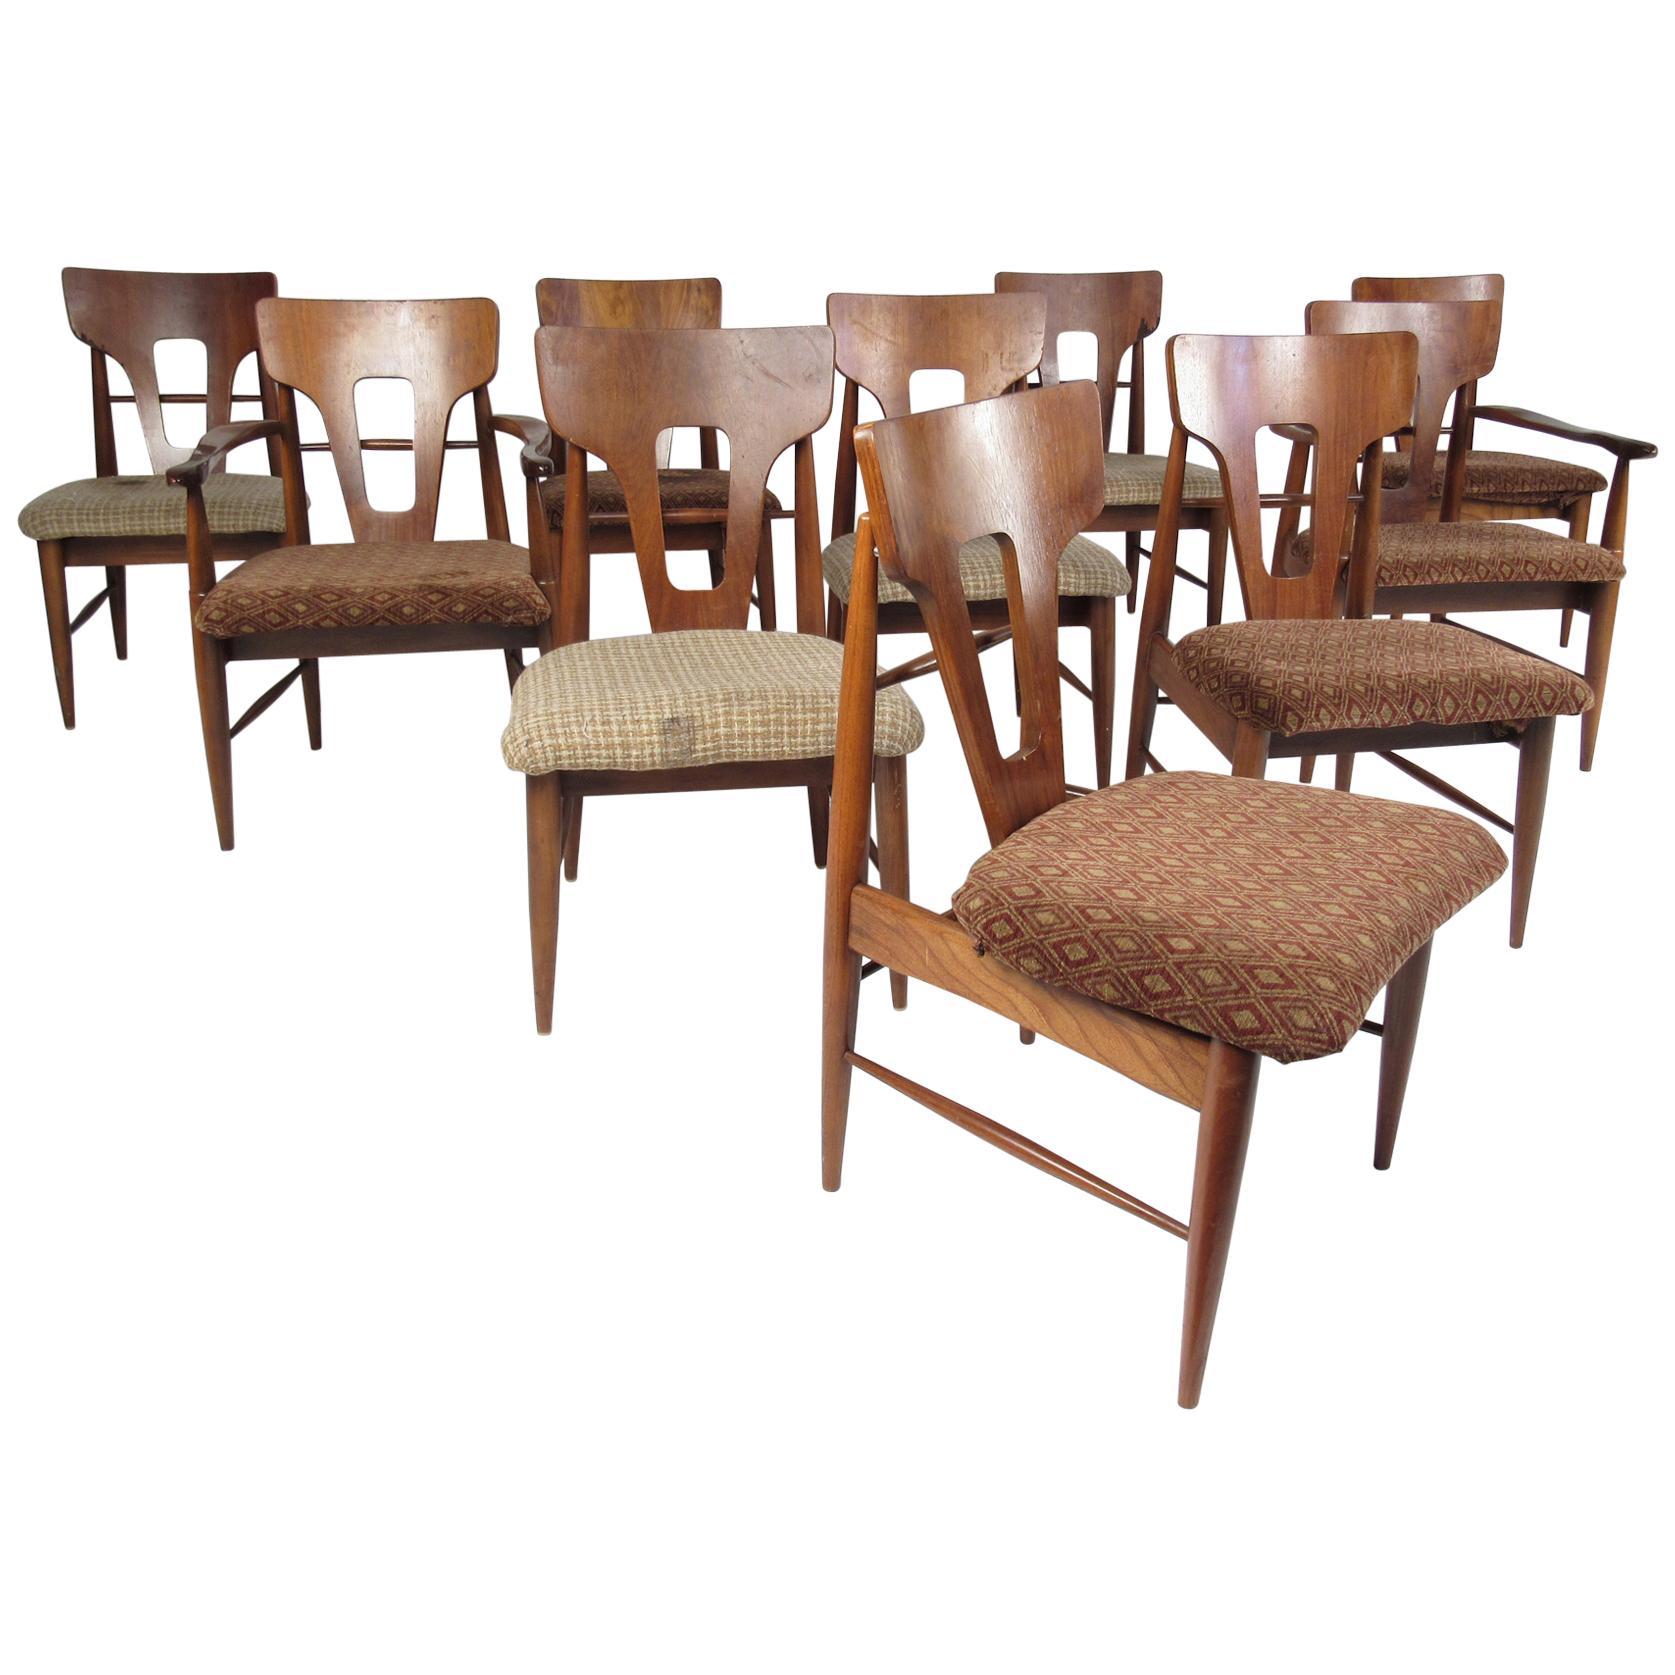 Set of Ten Mid-Century Modern Walnut Dining Chairs